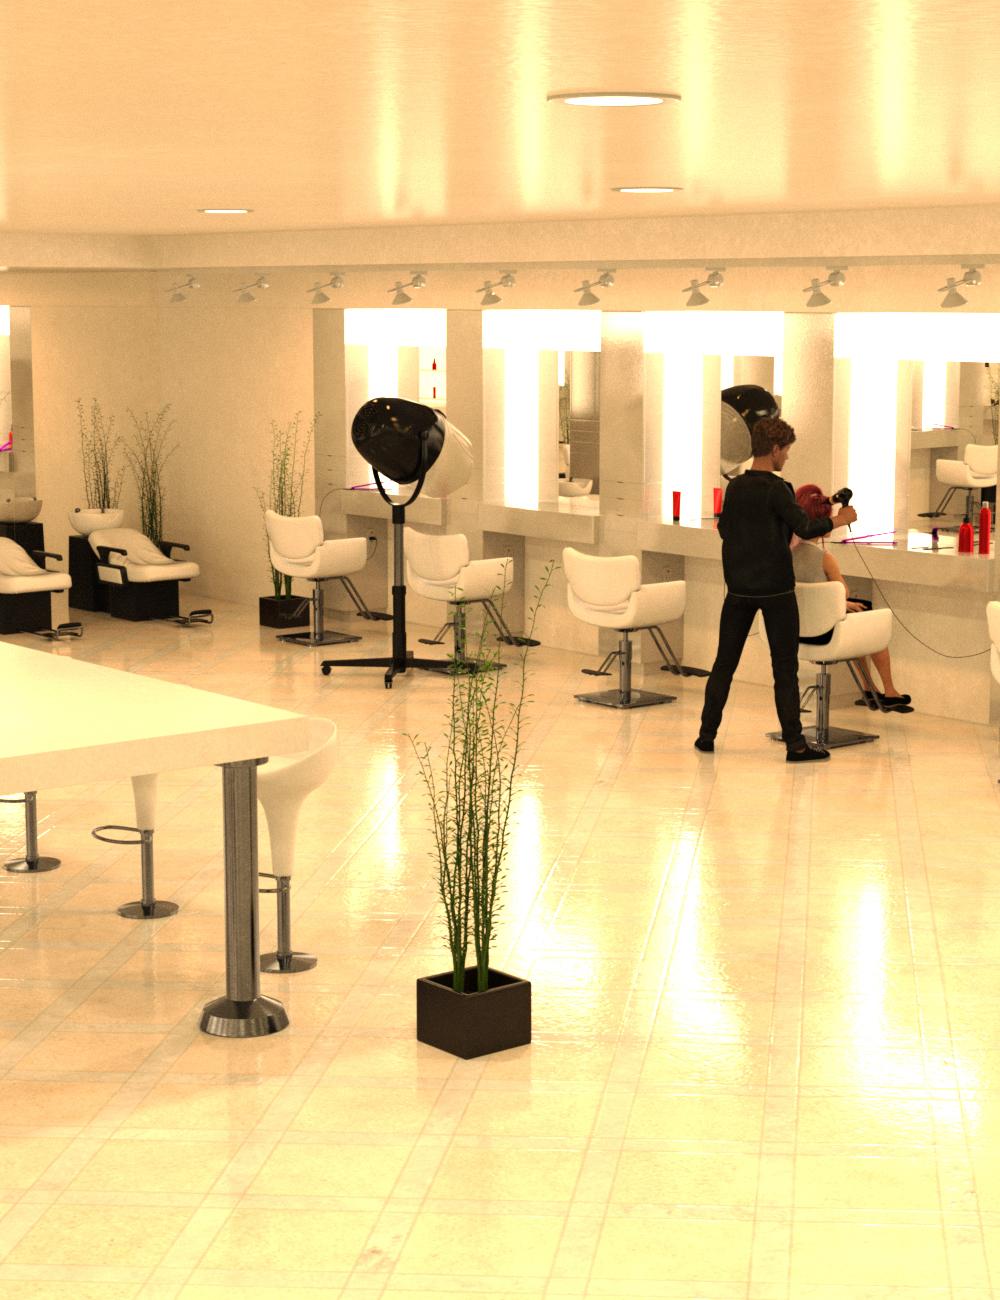 Hair Salon by: Charlie, 3D Models by Daz 3D